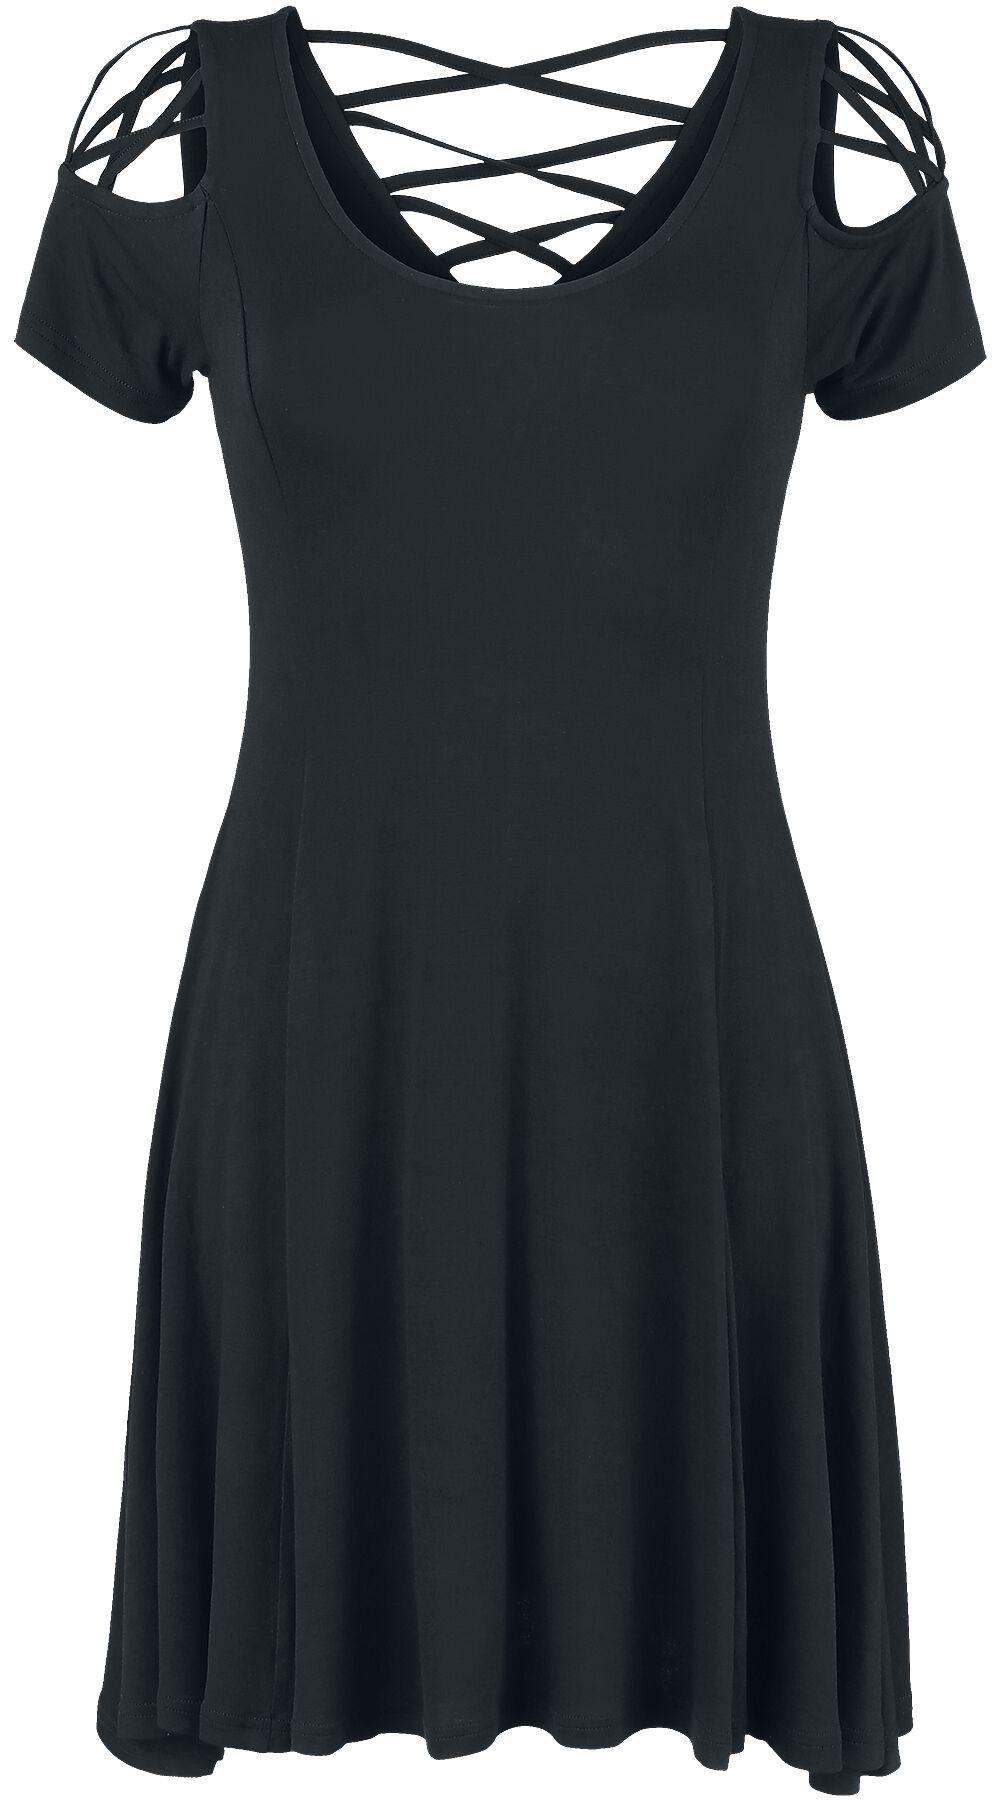 What It Takes   Black Premium by EMP Mittellanges Kleid   EMP 2a78ced268